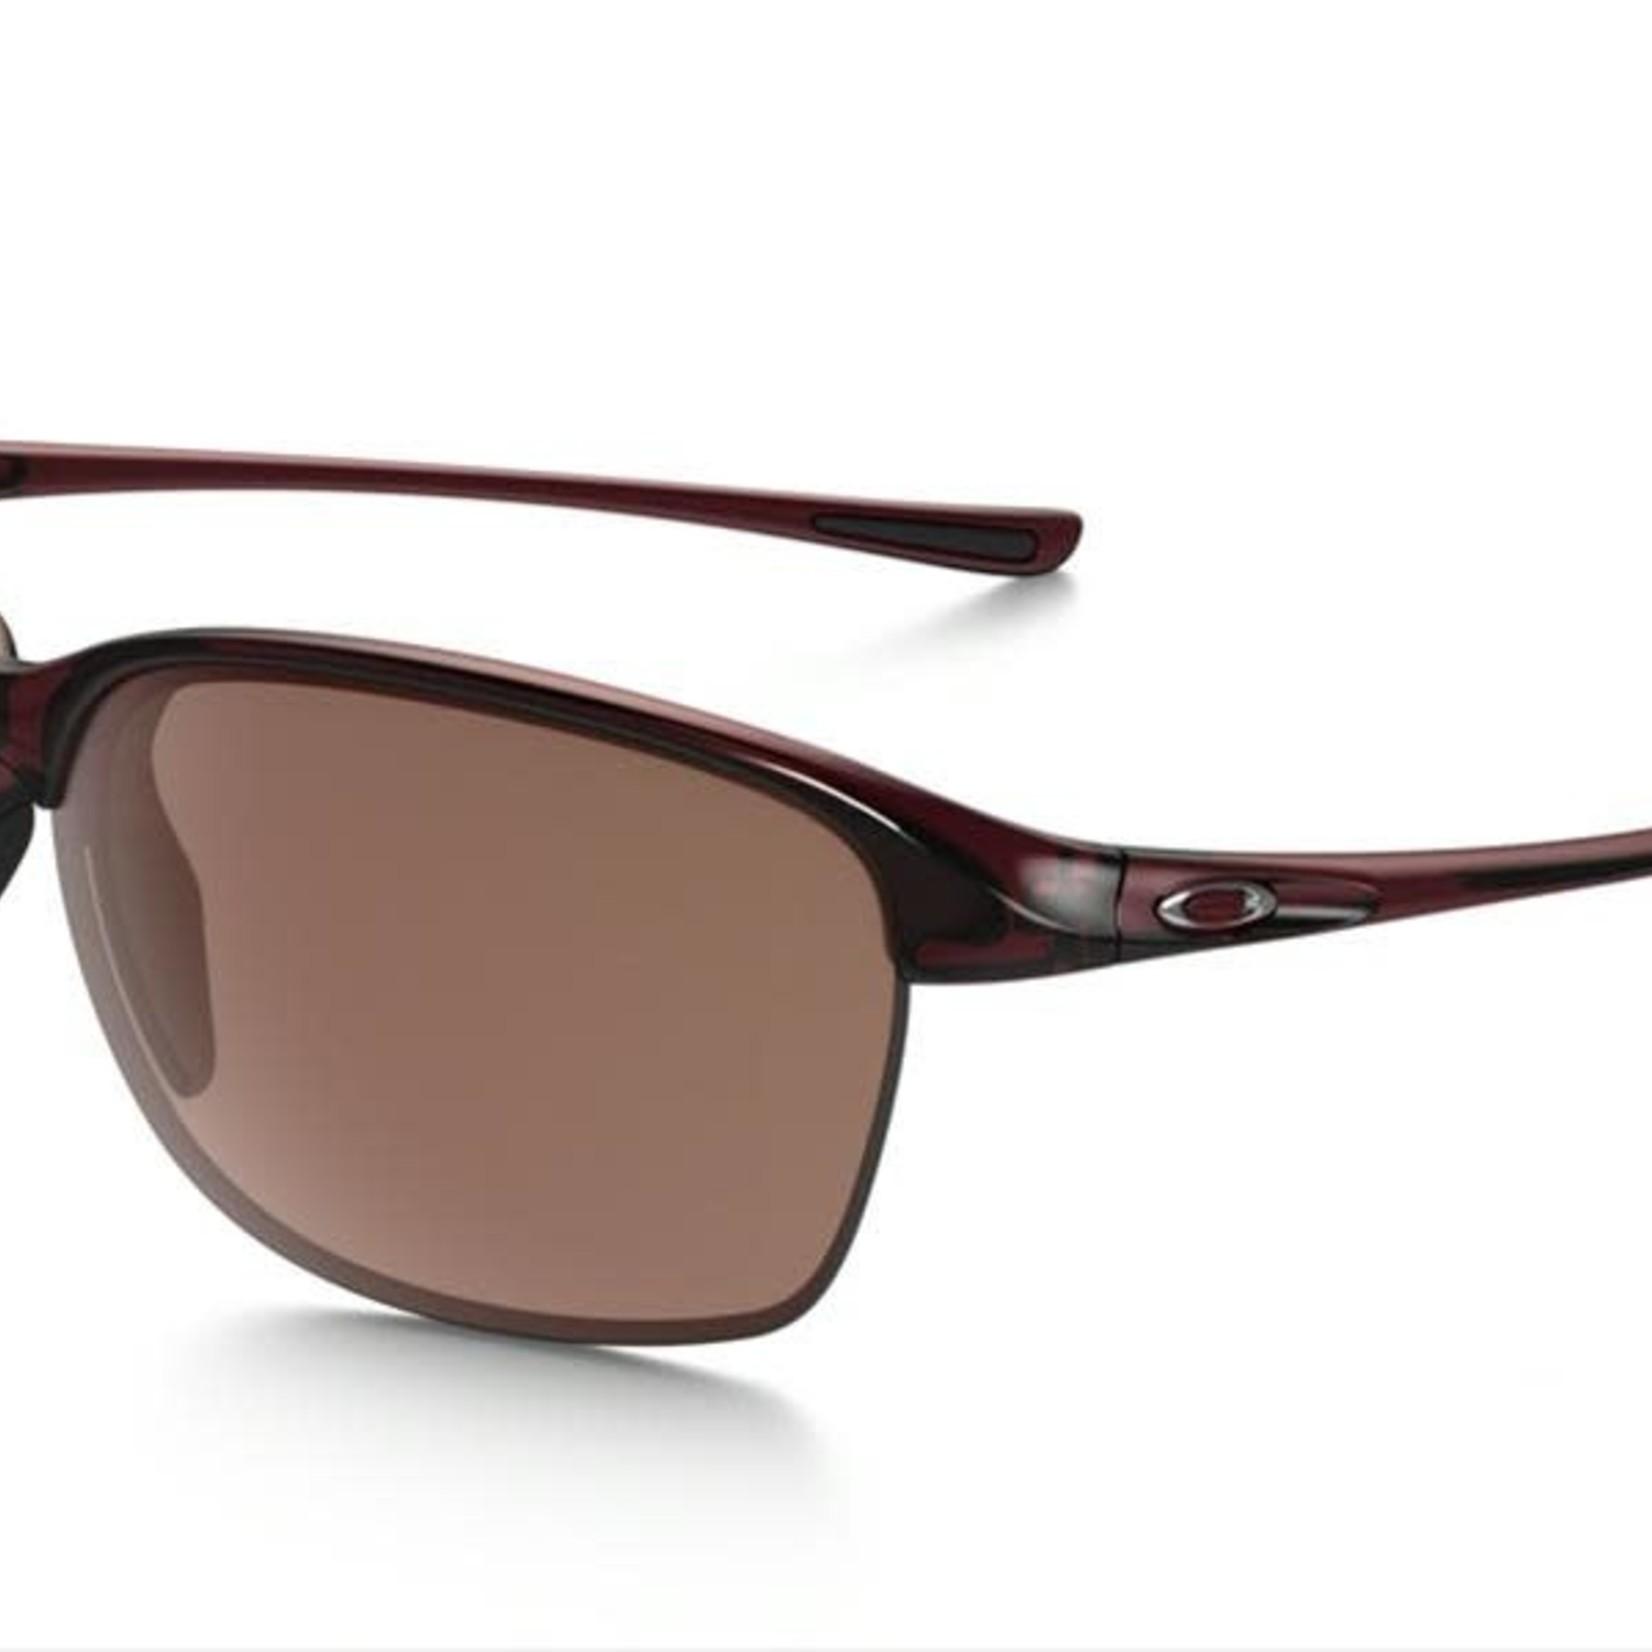 Oakley OO9191-07 Unstoppable Crystal Raspberry Sport Vr28 Black Iridium Lens Women's Sunglasses